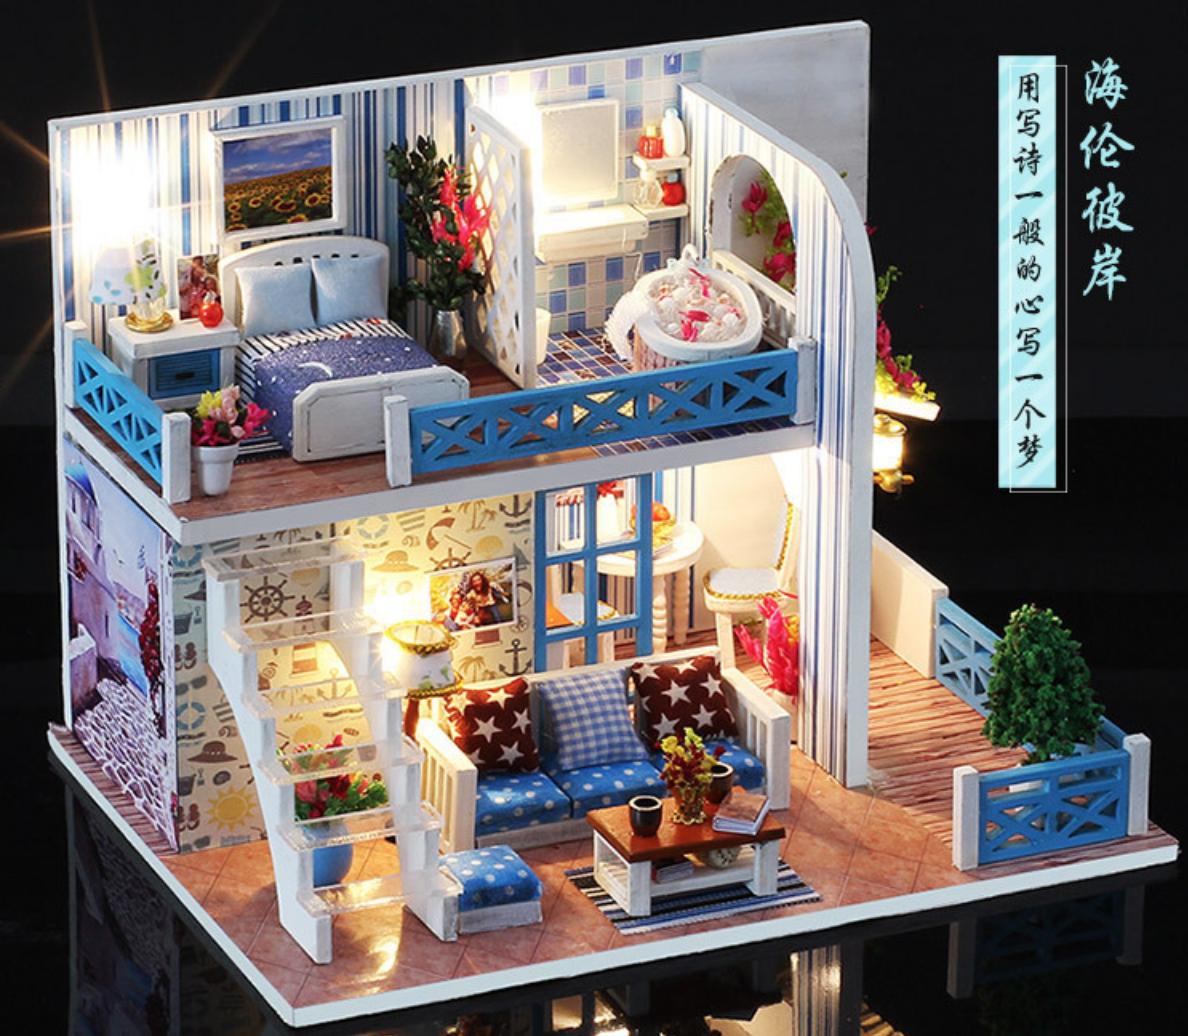 AinoKang iiE CREATE Home of Helen DIY Room